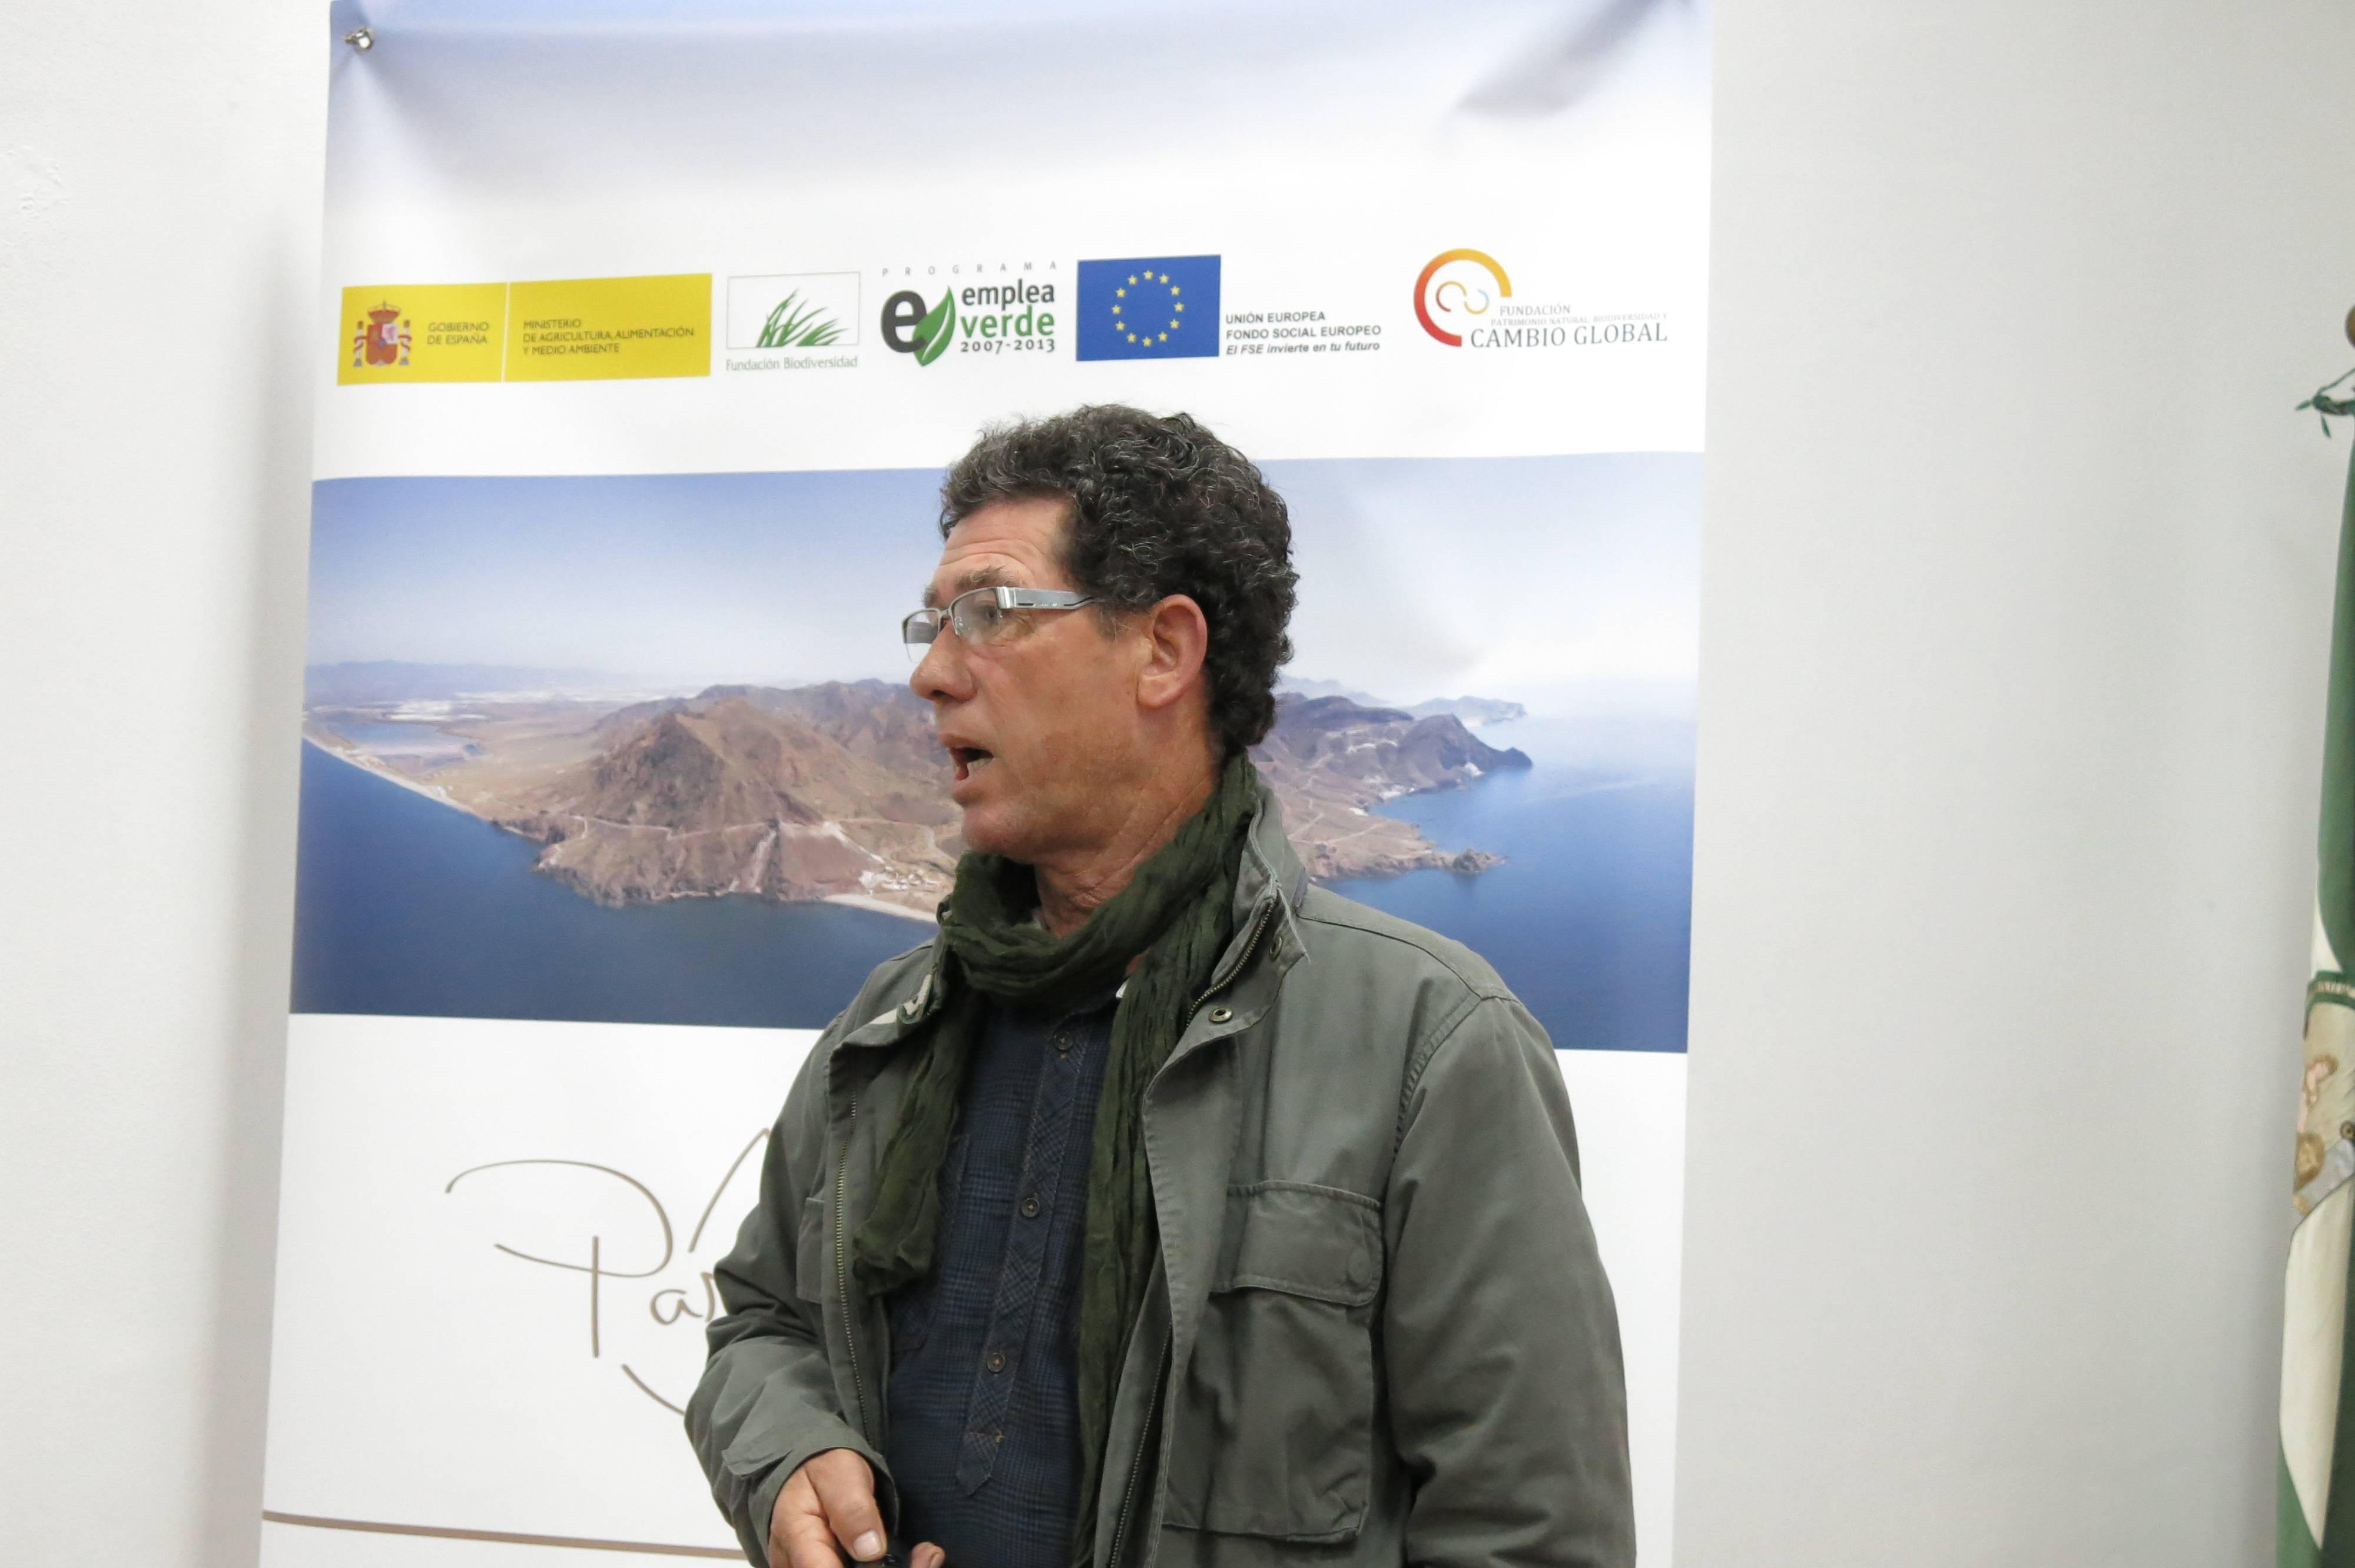 Luis Rodriguez Rodriguez pescador de Cabo de Gata